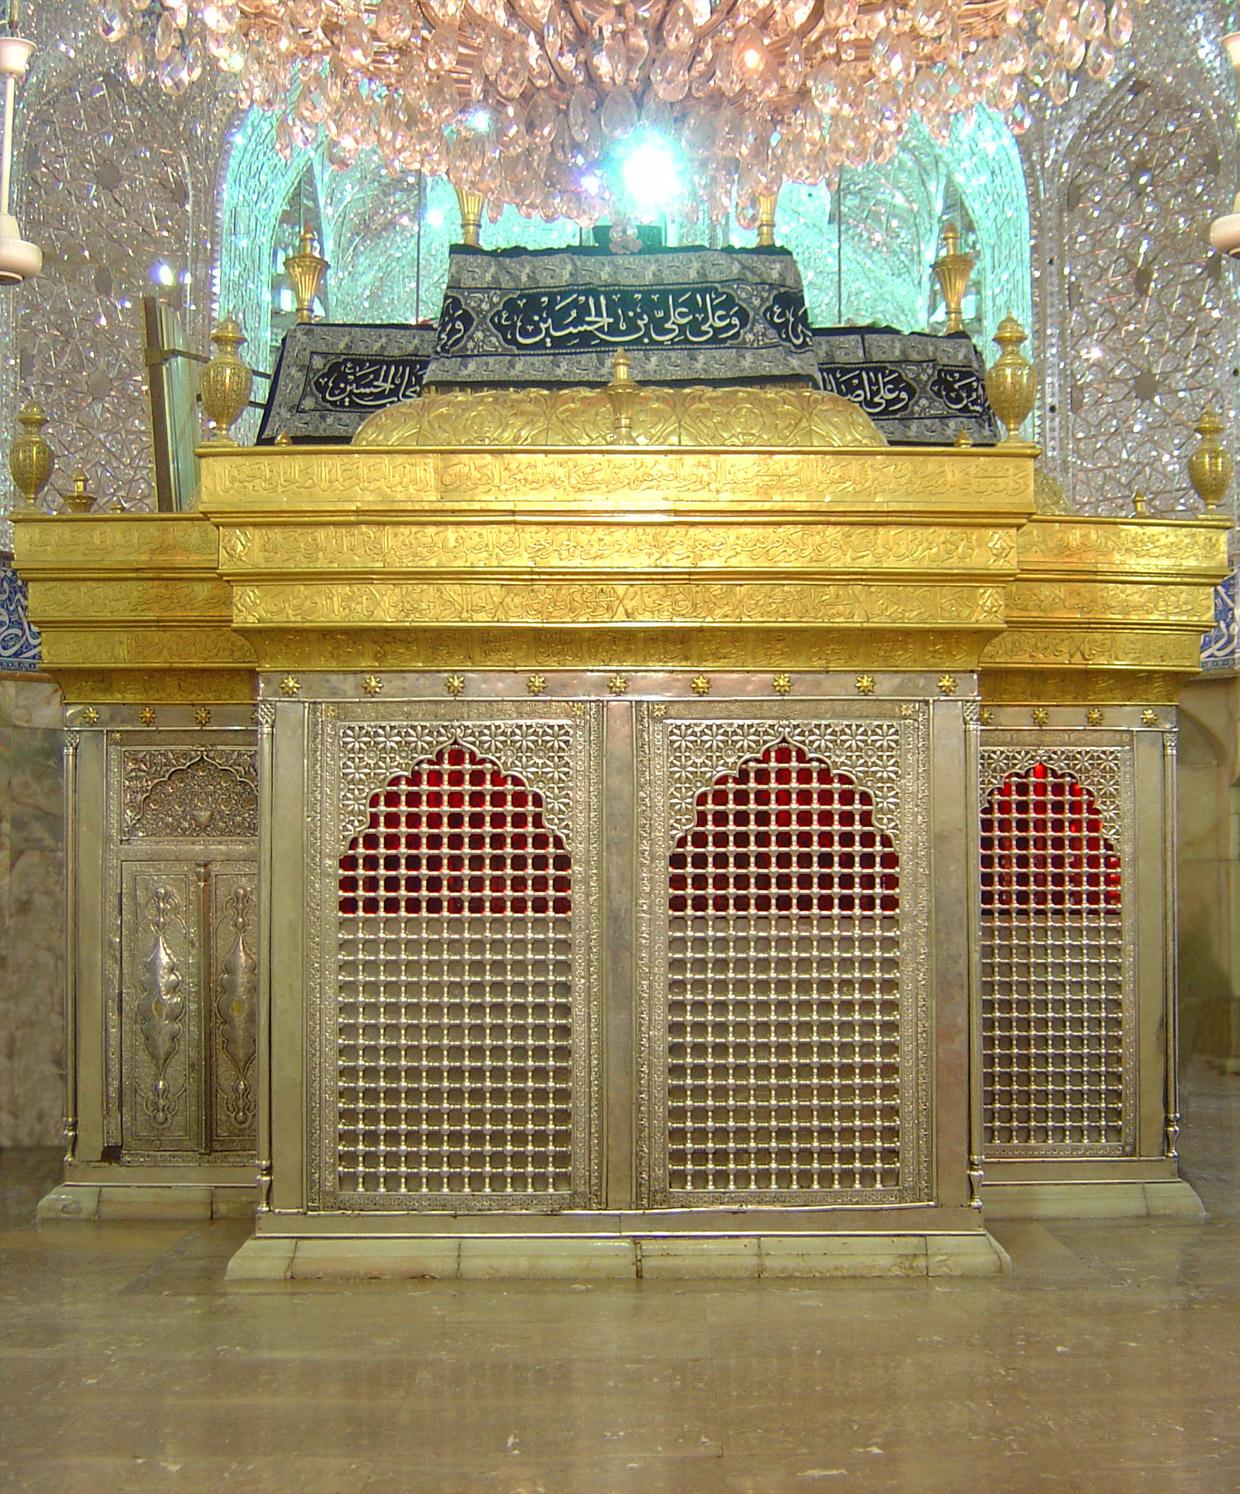 ضریح شش گوشه حضرت امام حسین علیه السلام - 2 --- عکس زیبا و با کیفیت از ضریح امام حسین علیه السلام در کربلا